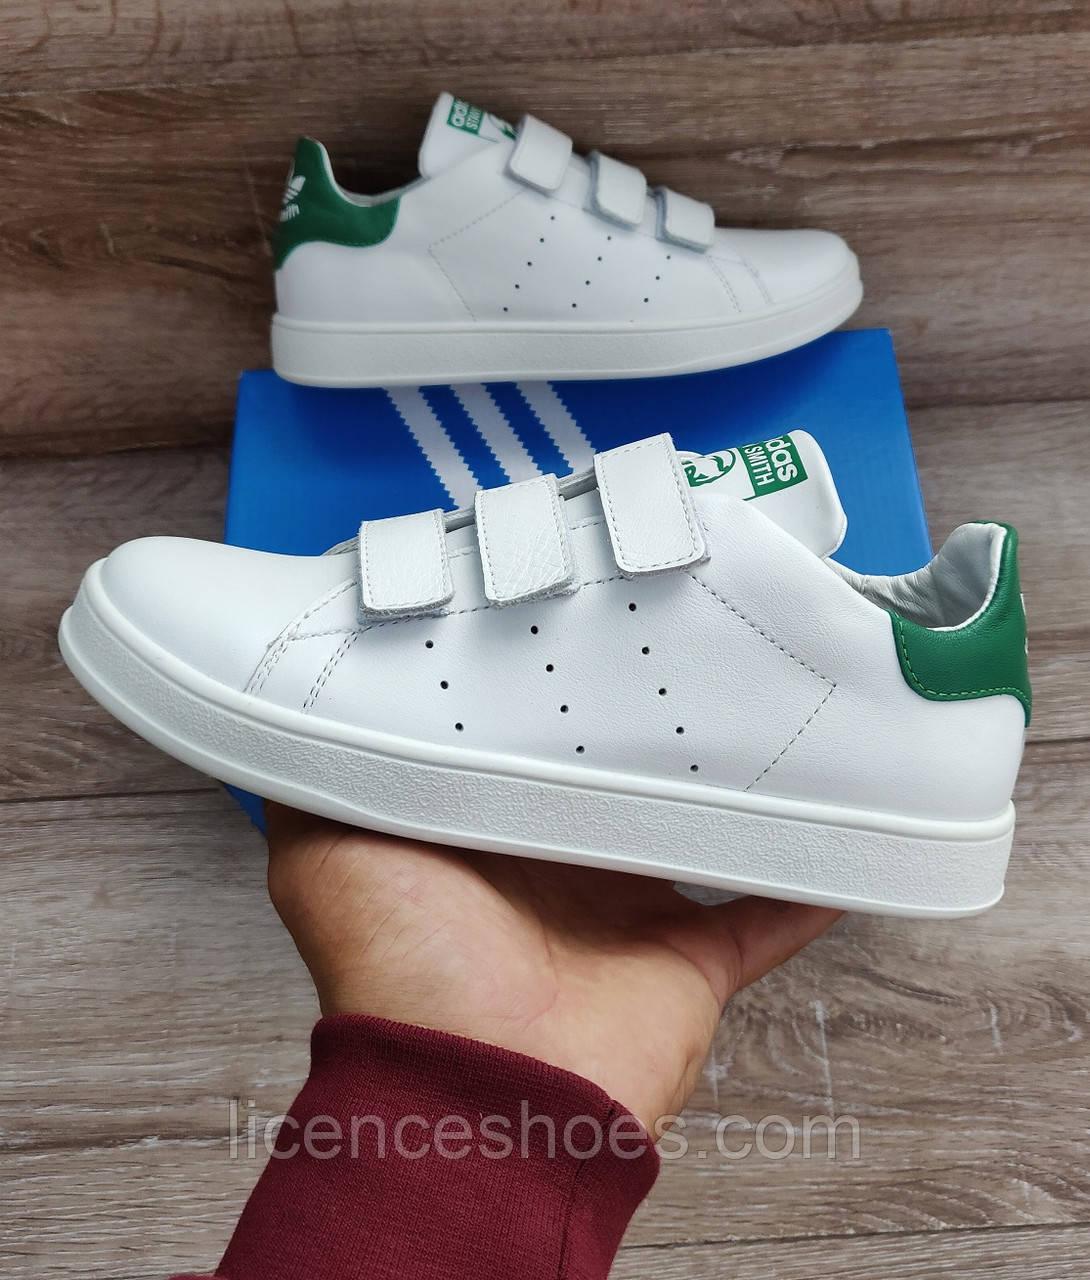 Жіночі кросівки Adidas Stan Smith White Green. ЛИПУЧКА. Натуральна шкіра